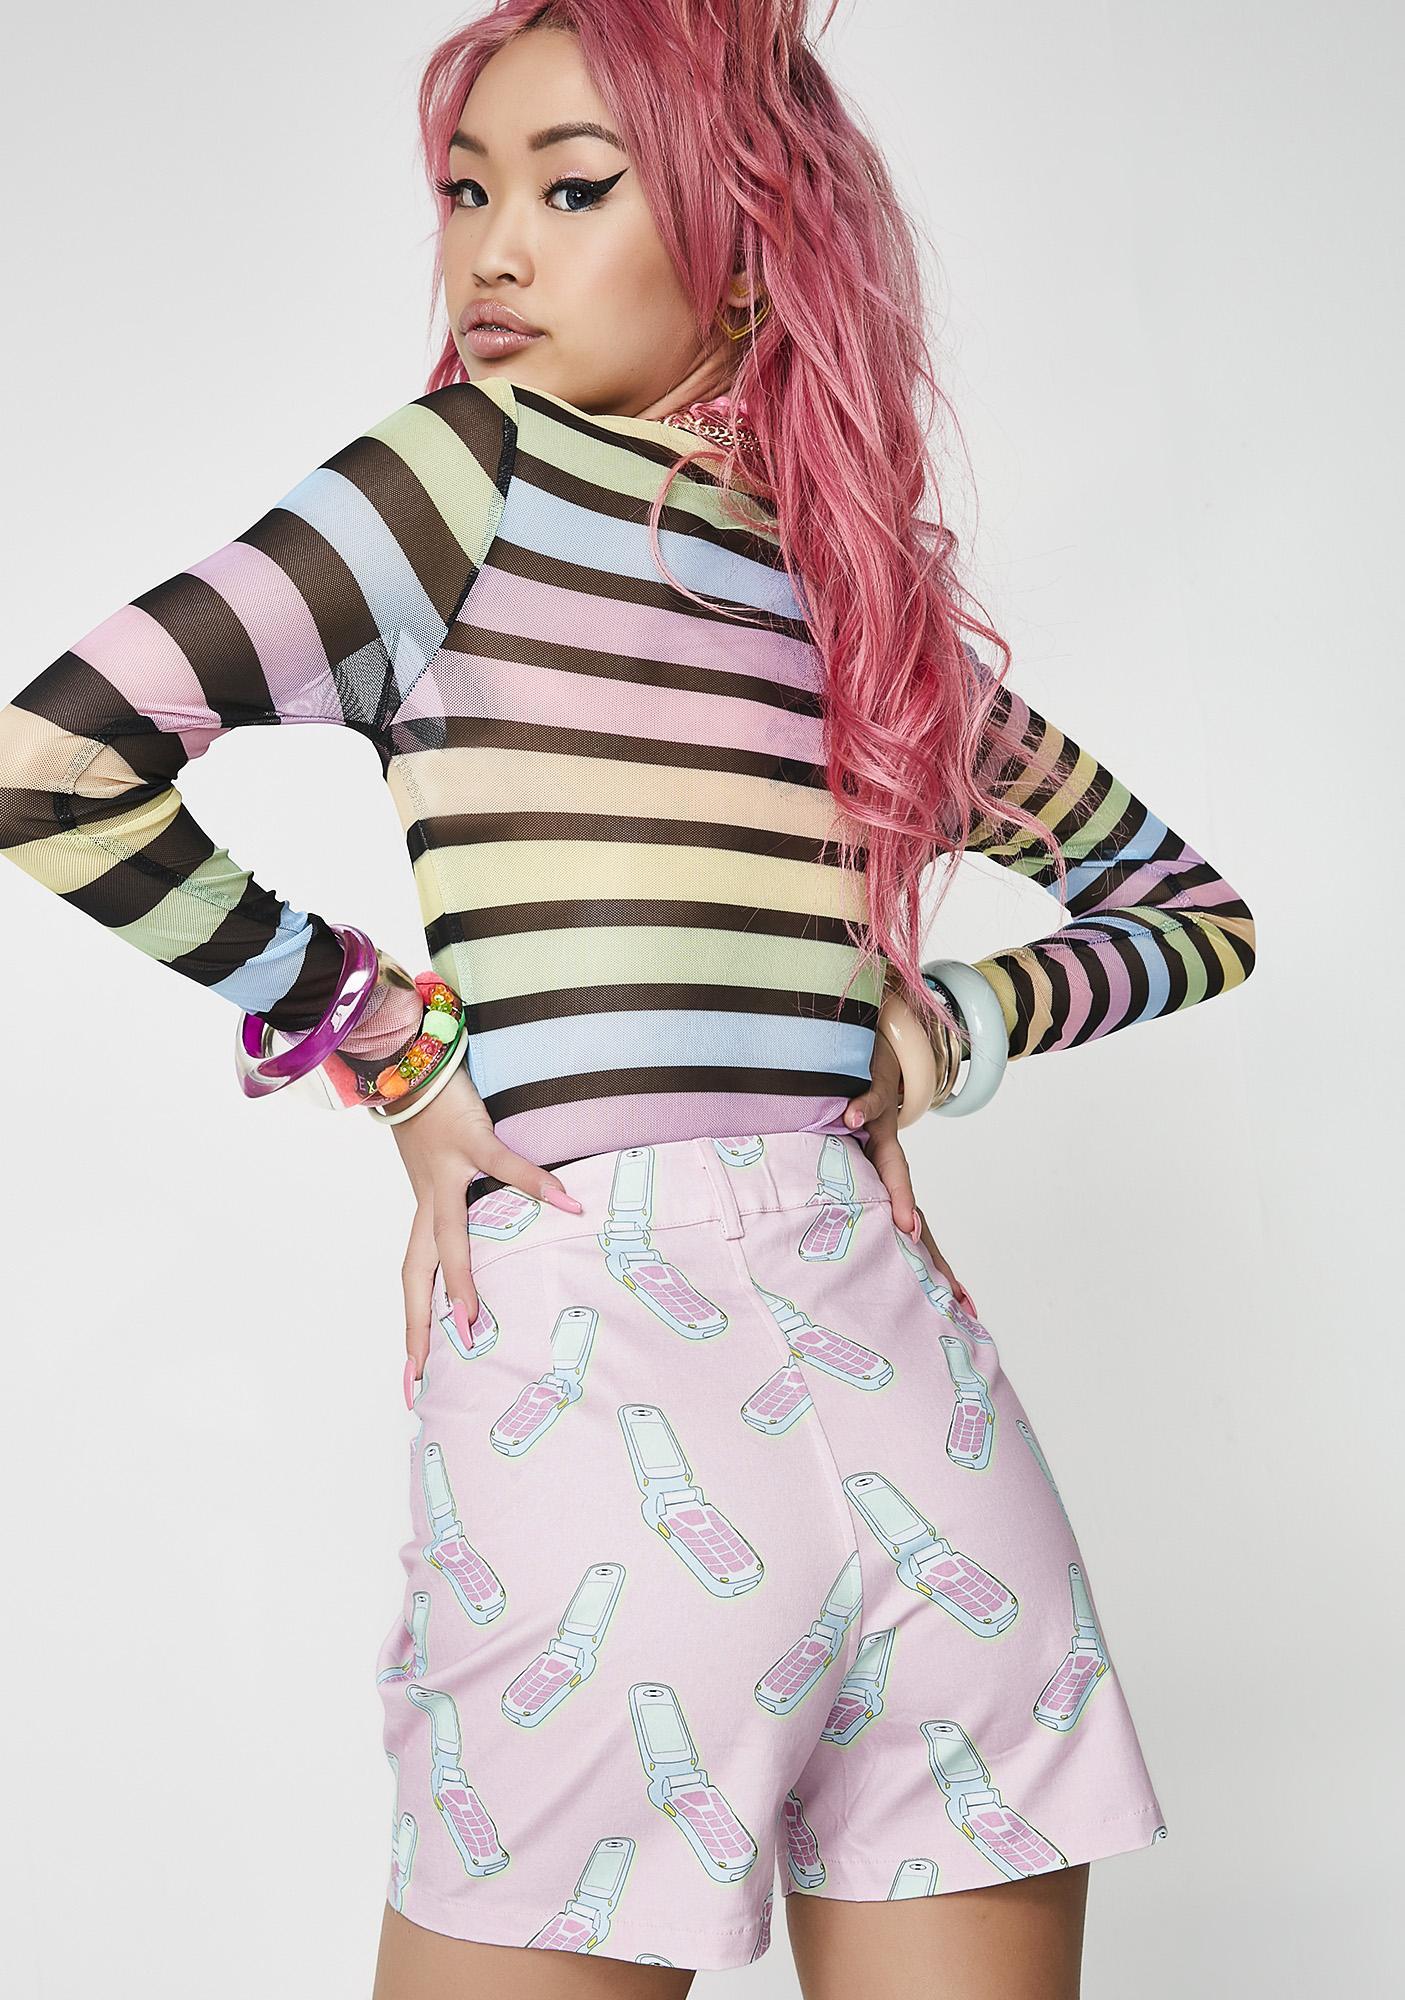 Hayley Elsaesser Flip Phone Denim Shorts